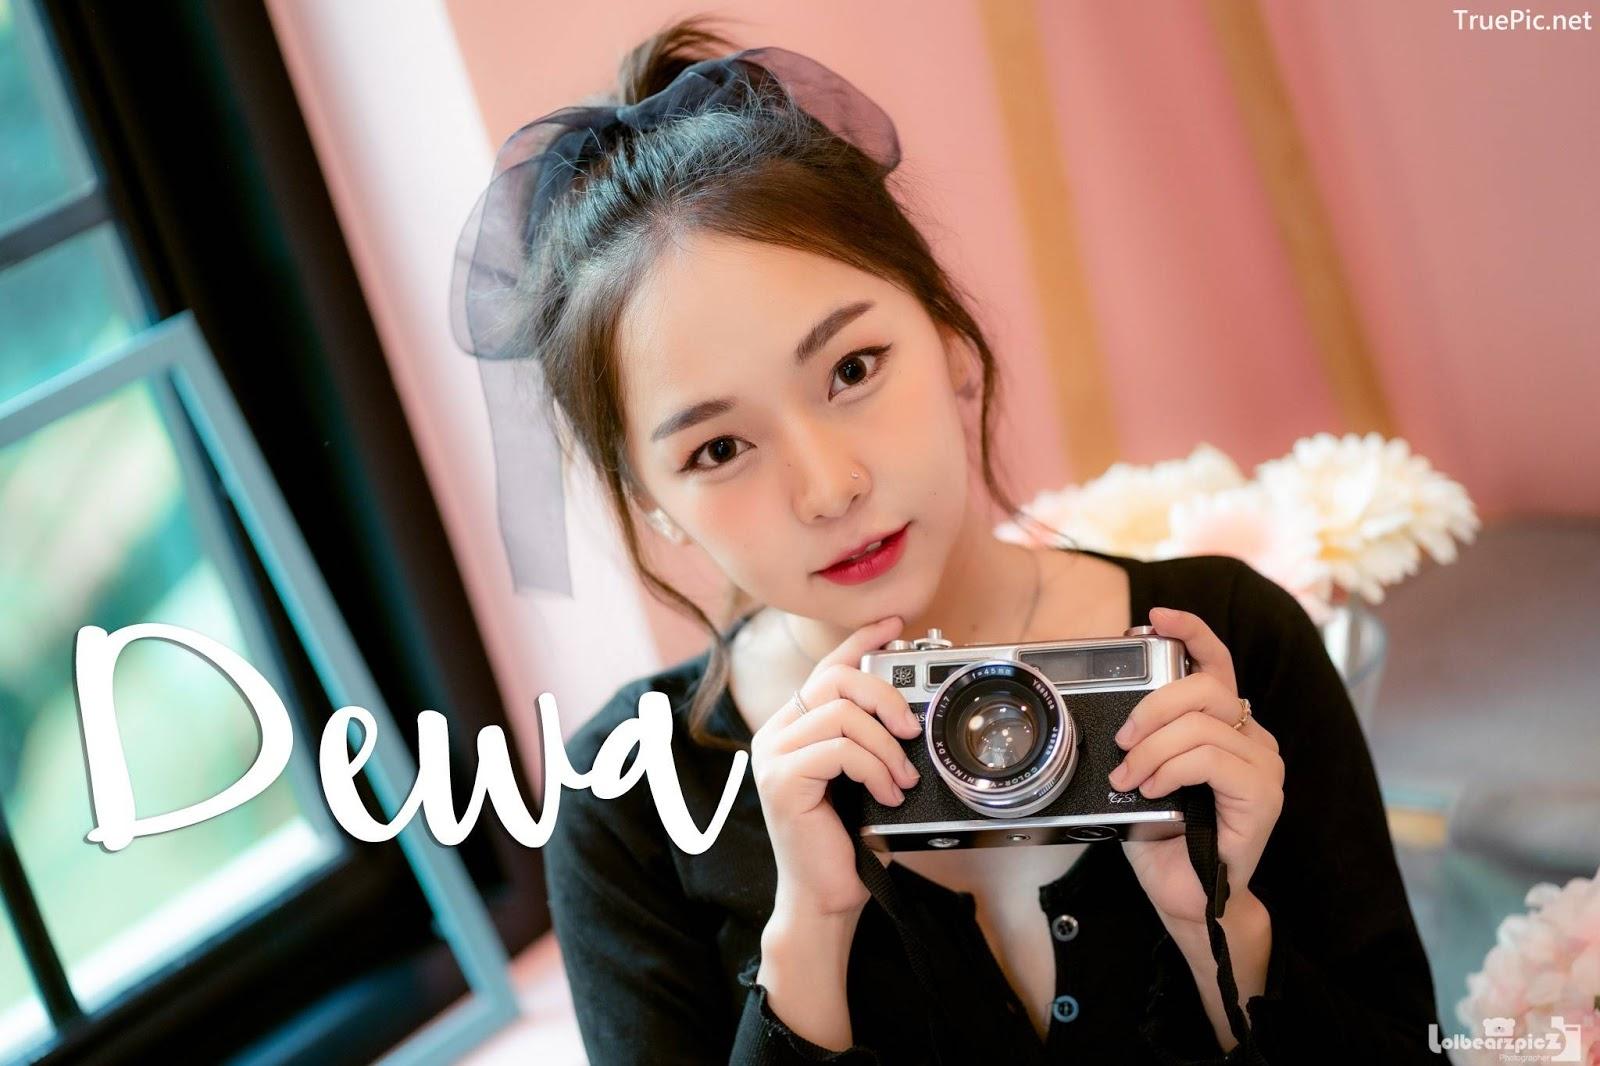 Image Thailand Model - Sunna Dewa - Cute Naughty Girl - TruePic.net - Picture-1